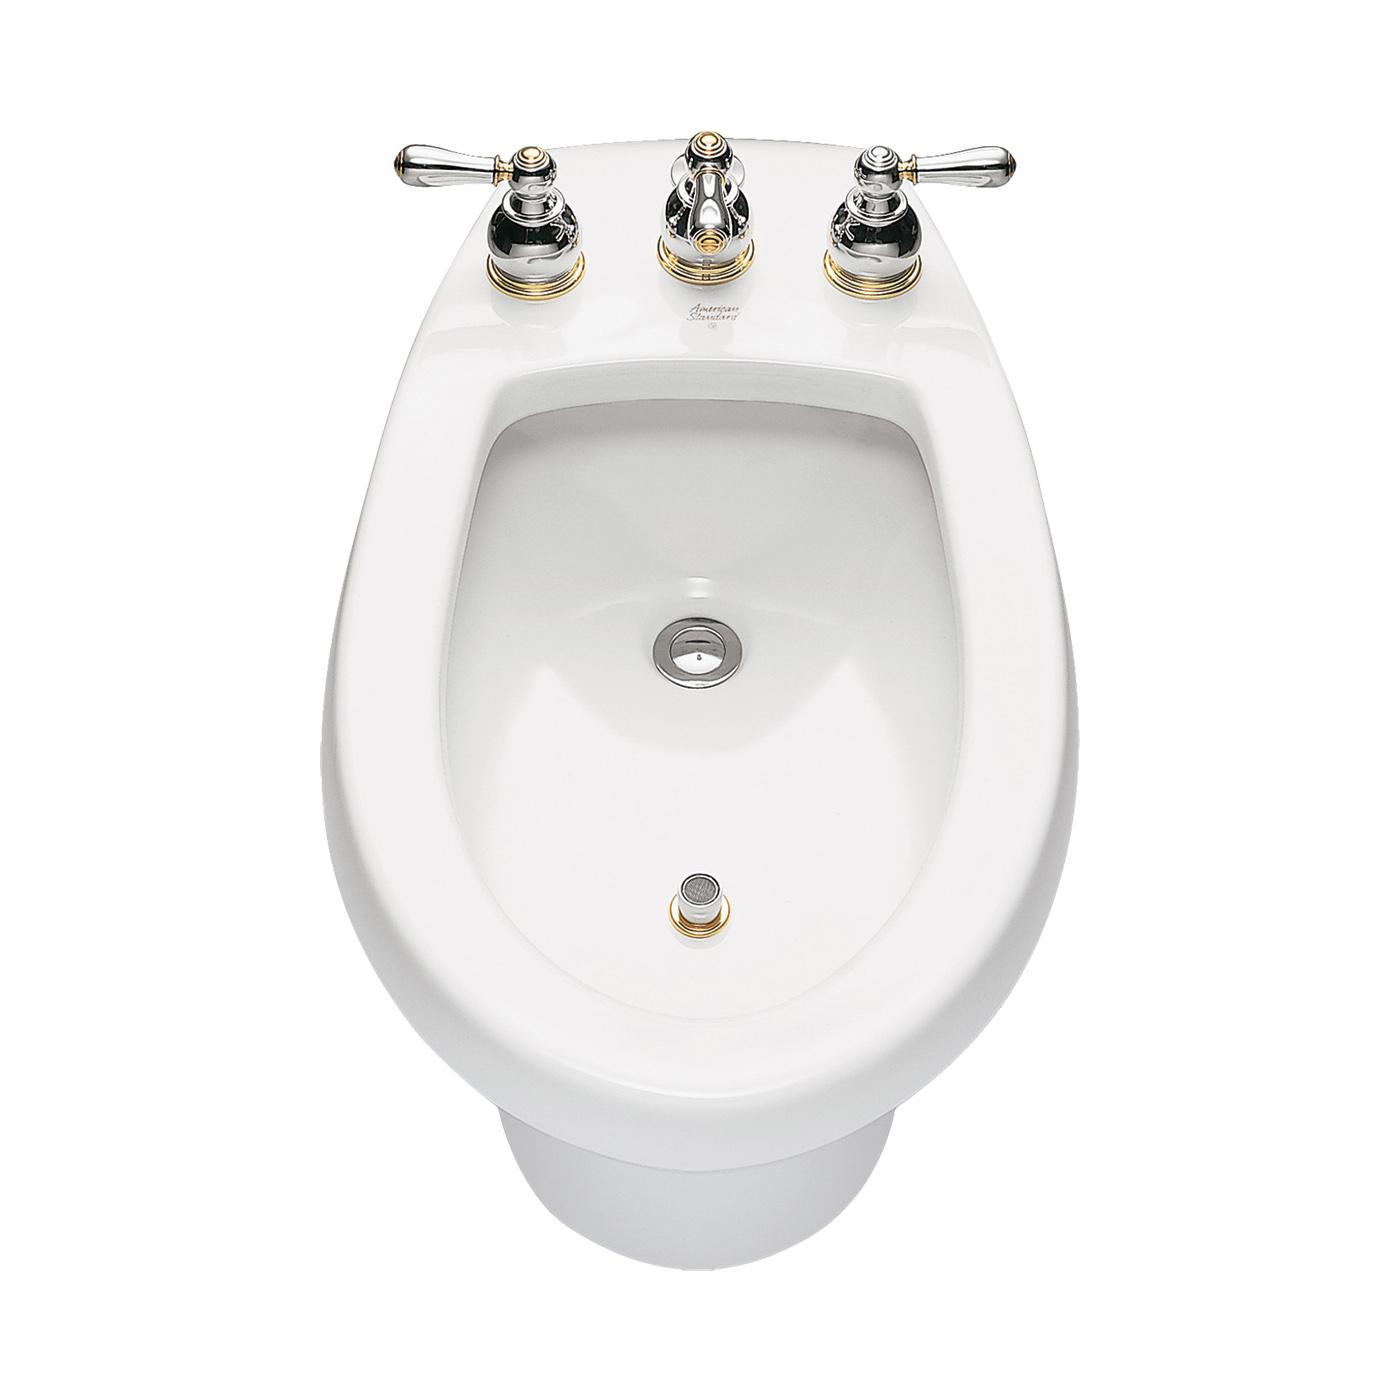 American Standard 5023.100.020 Cadet® Bidet Toilet With (2) Bolt Caps, Elongated Bowl, 14-7/8 in H Rim, White, Import